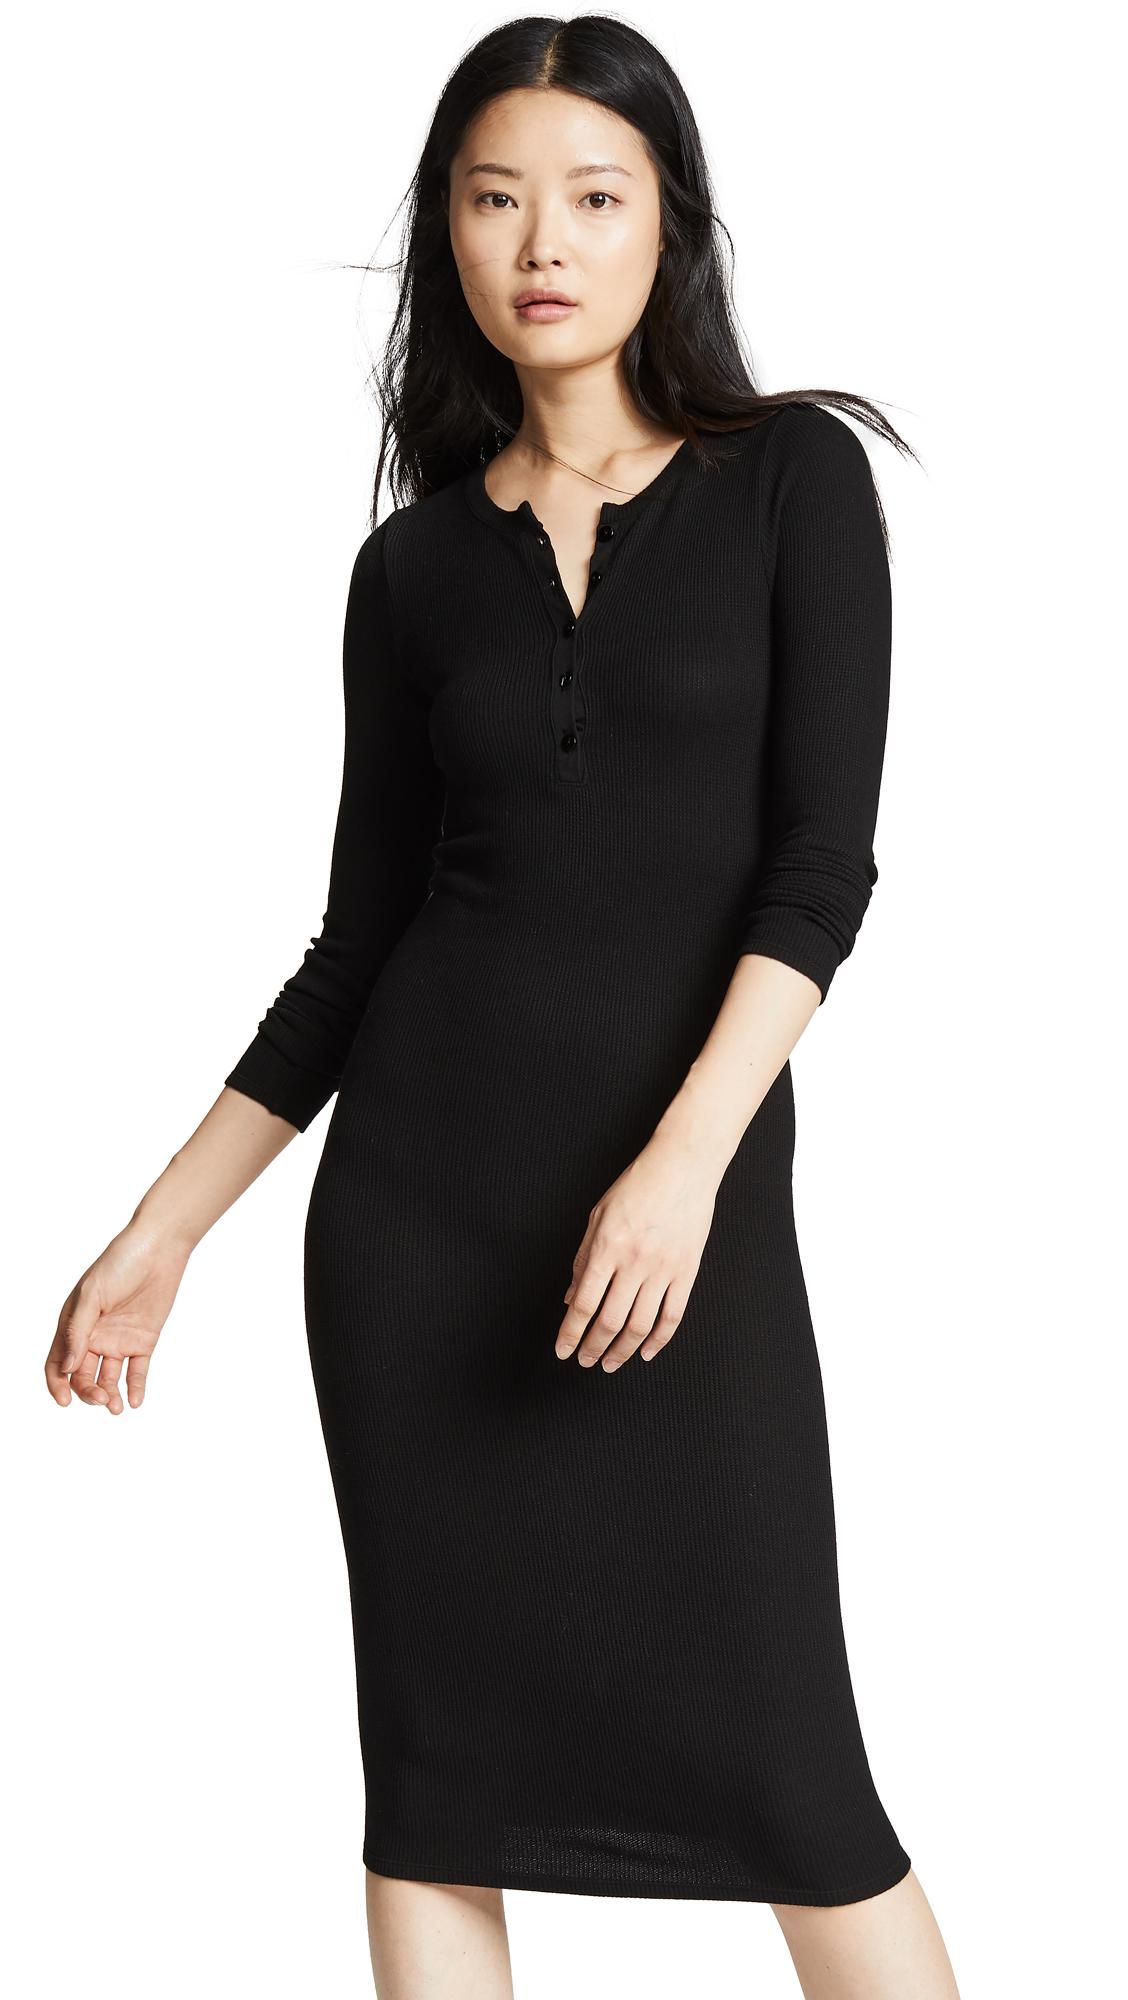 ENZA COSTA Thermal Long Sleeve Henley Midi Dress in Black